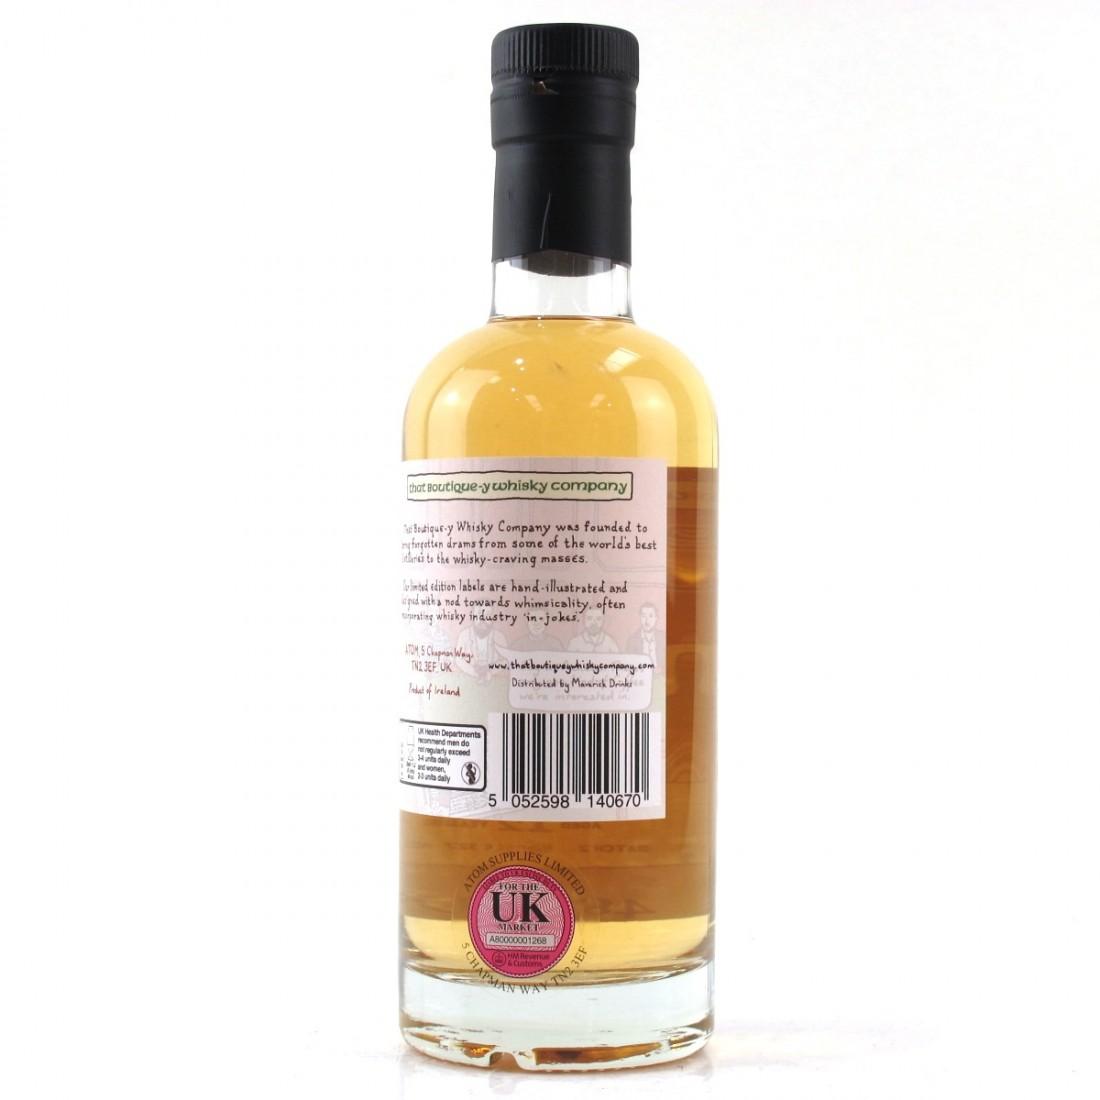 Irish Single Malt #2 That Boutique-y Whisky Company 12 Year Old Batch #2